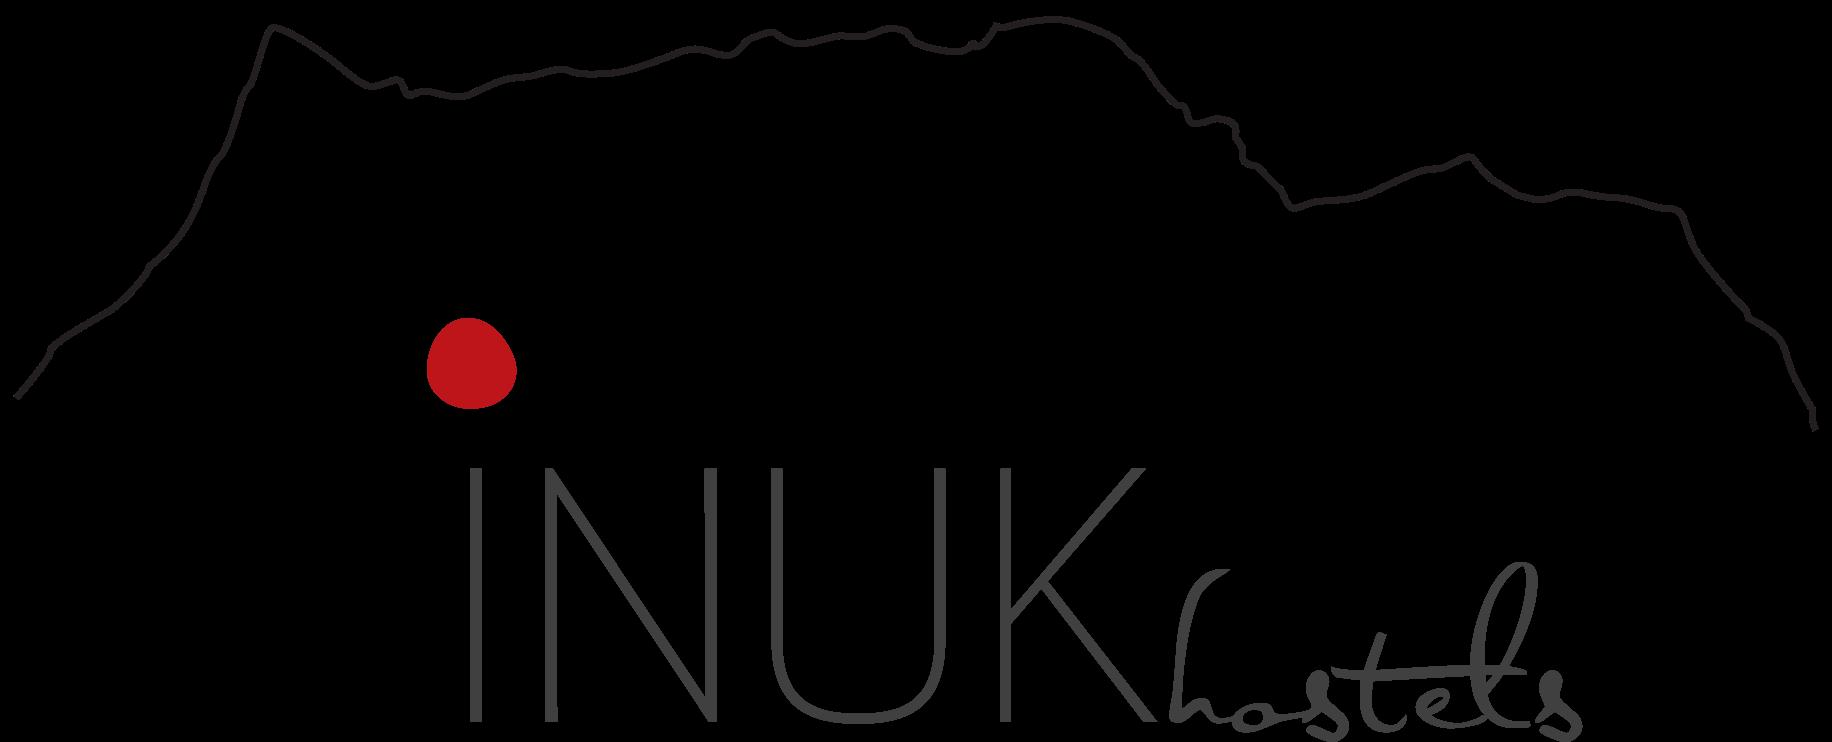 Inuk Hostels